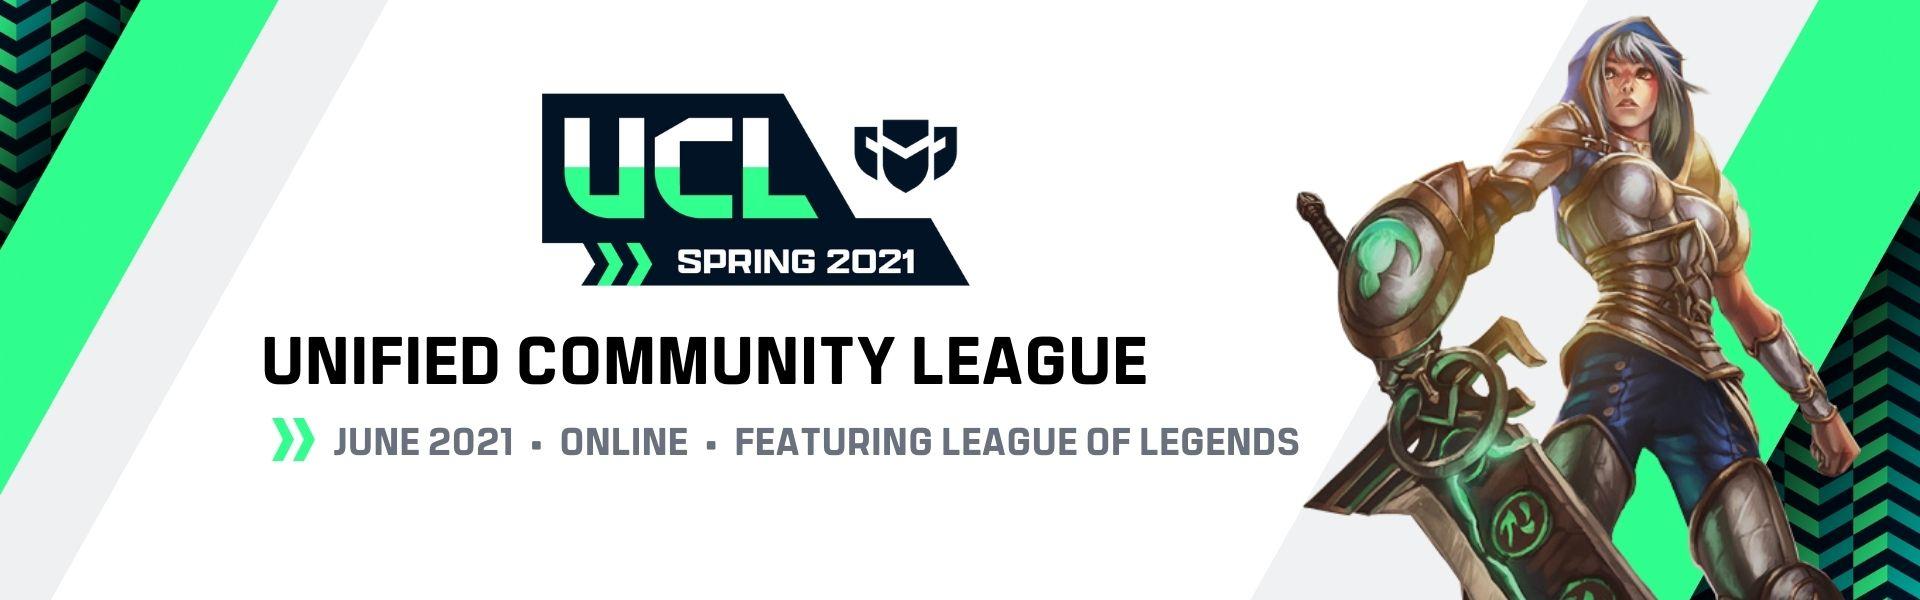 June CEL: Featuring League of Legends